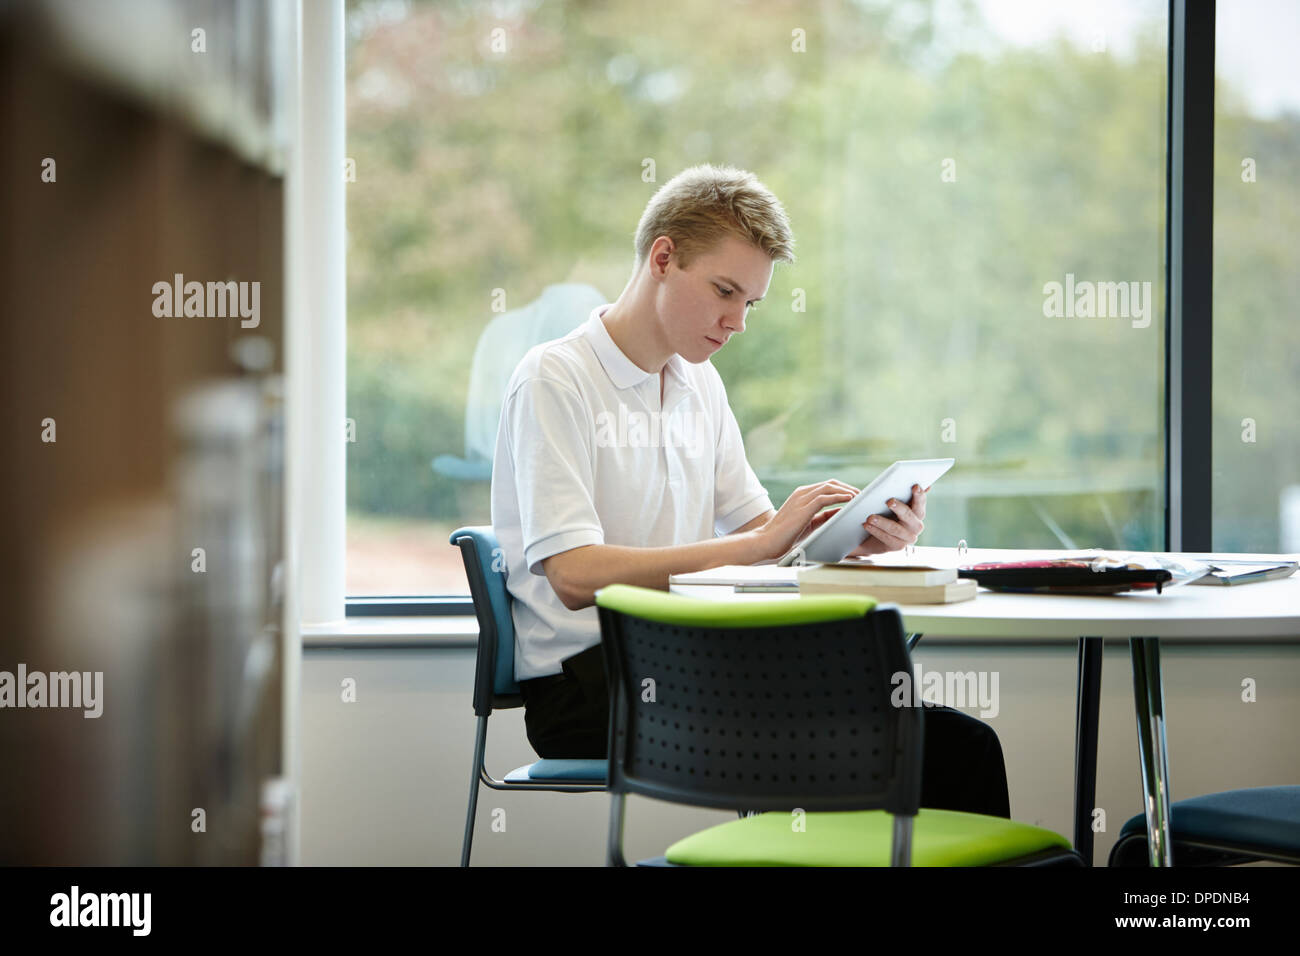 Teenage boy using digital tablet in library - Stock Image